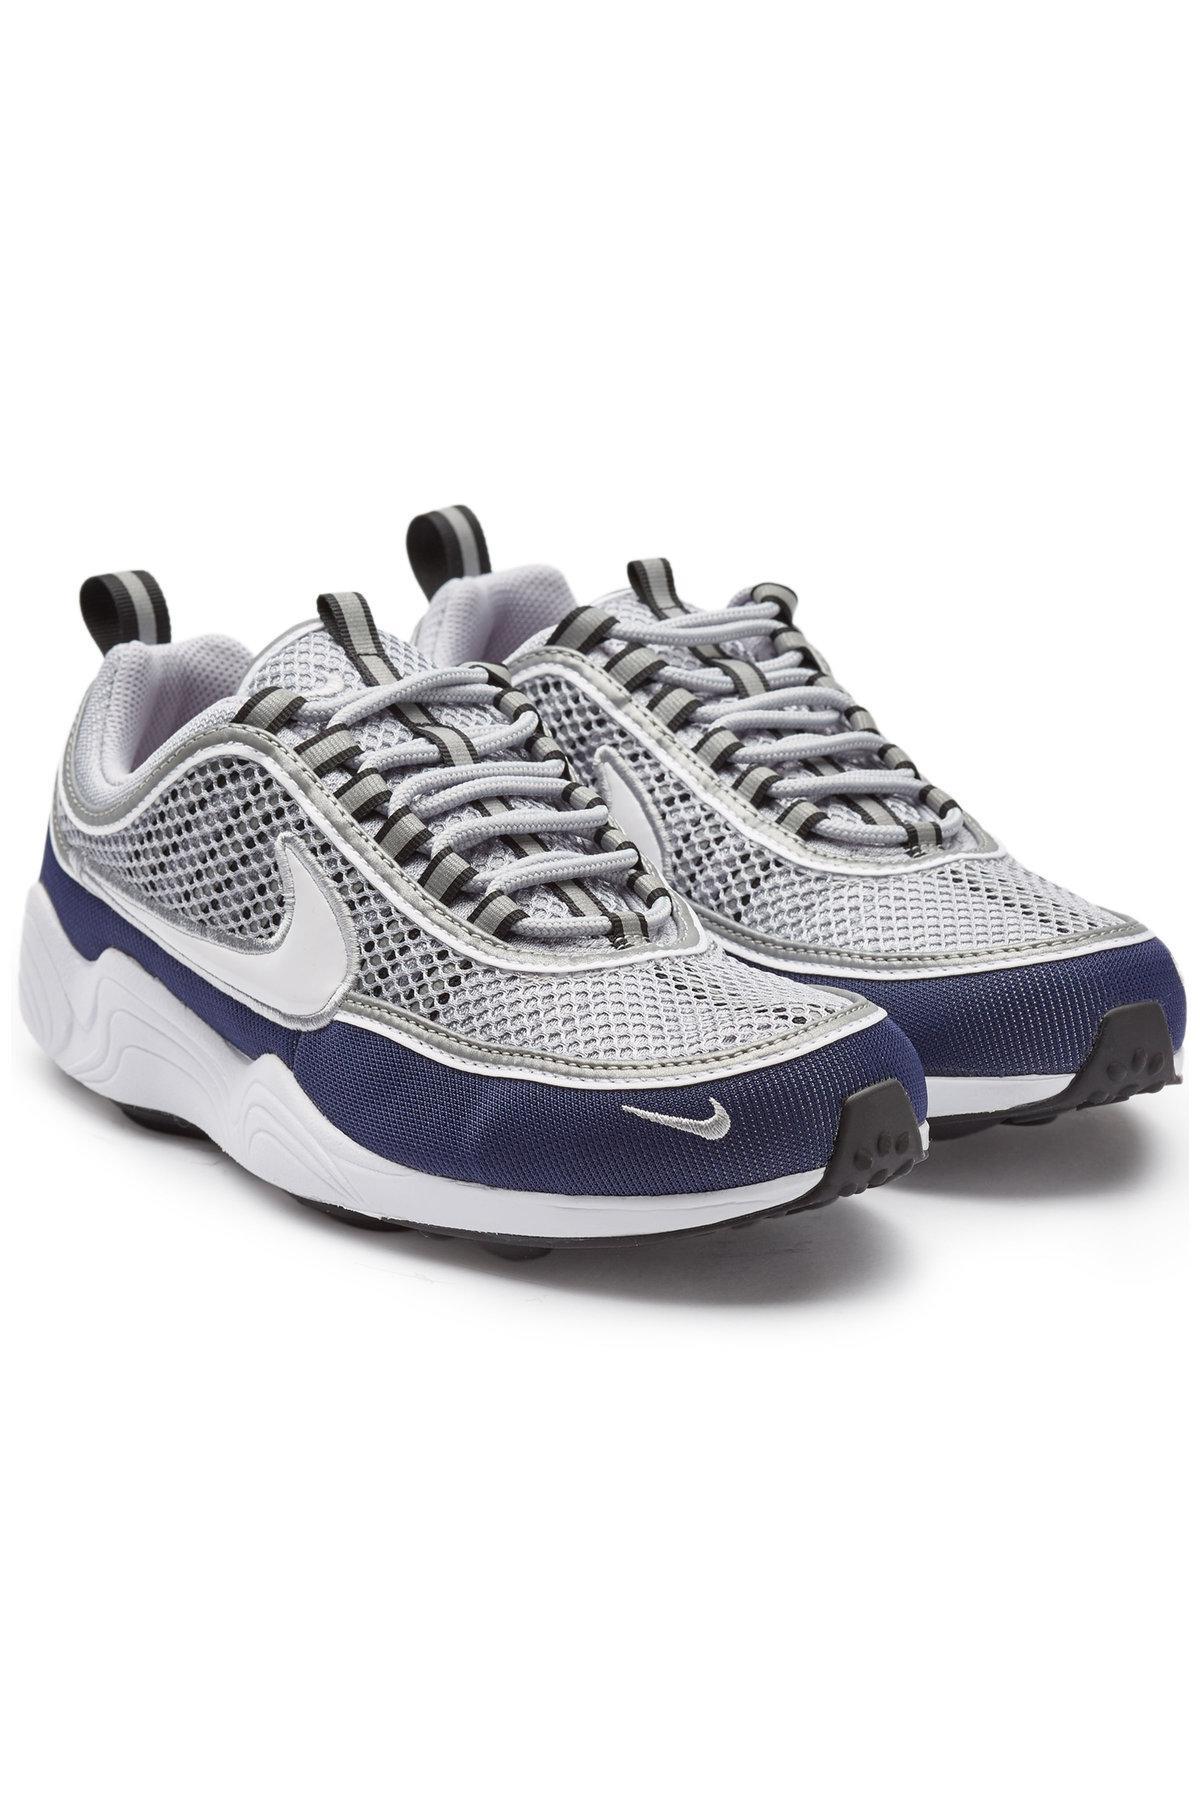 b7058705f74a Nike Air Zoom Spiridon 16 Sneakers for Men - Lyst